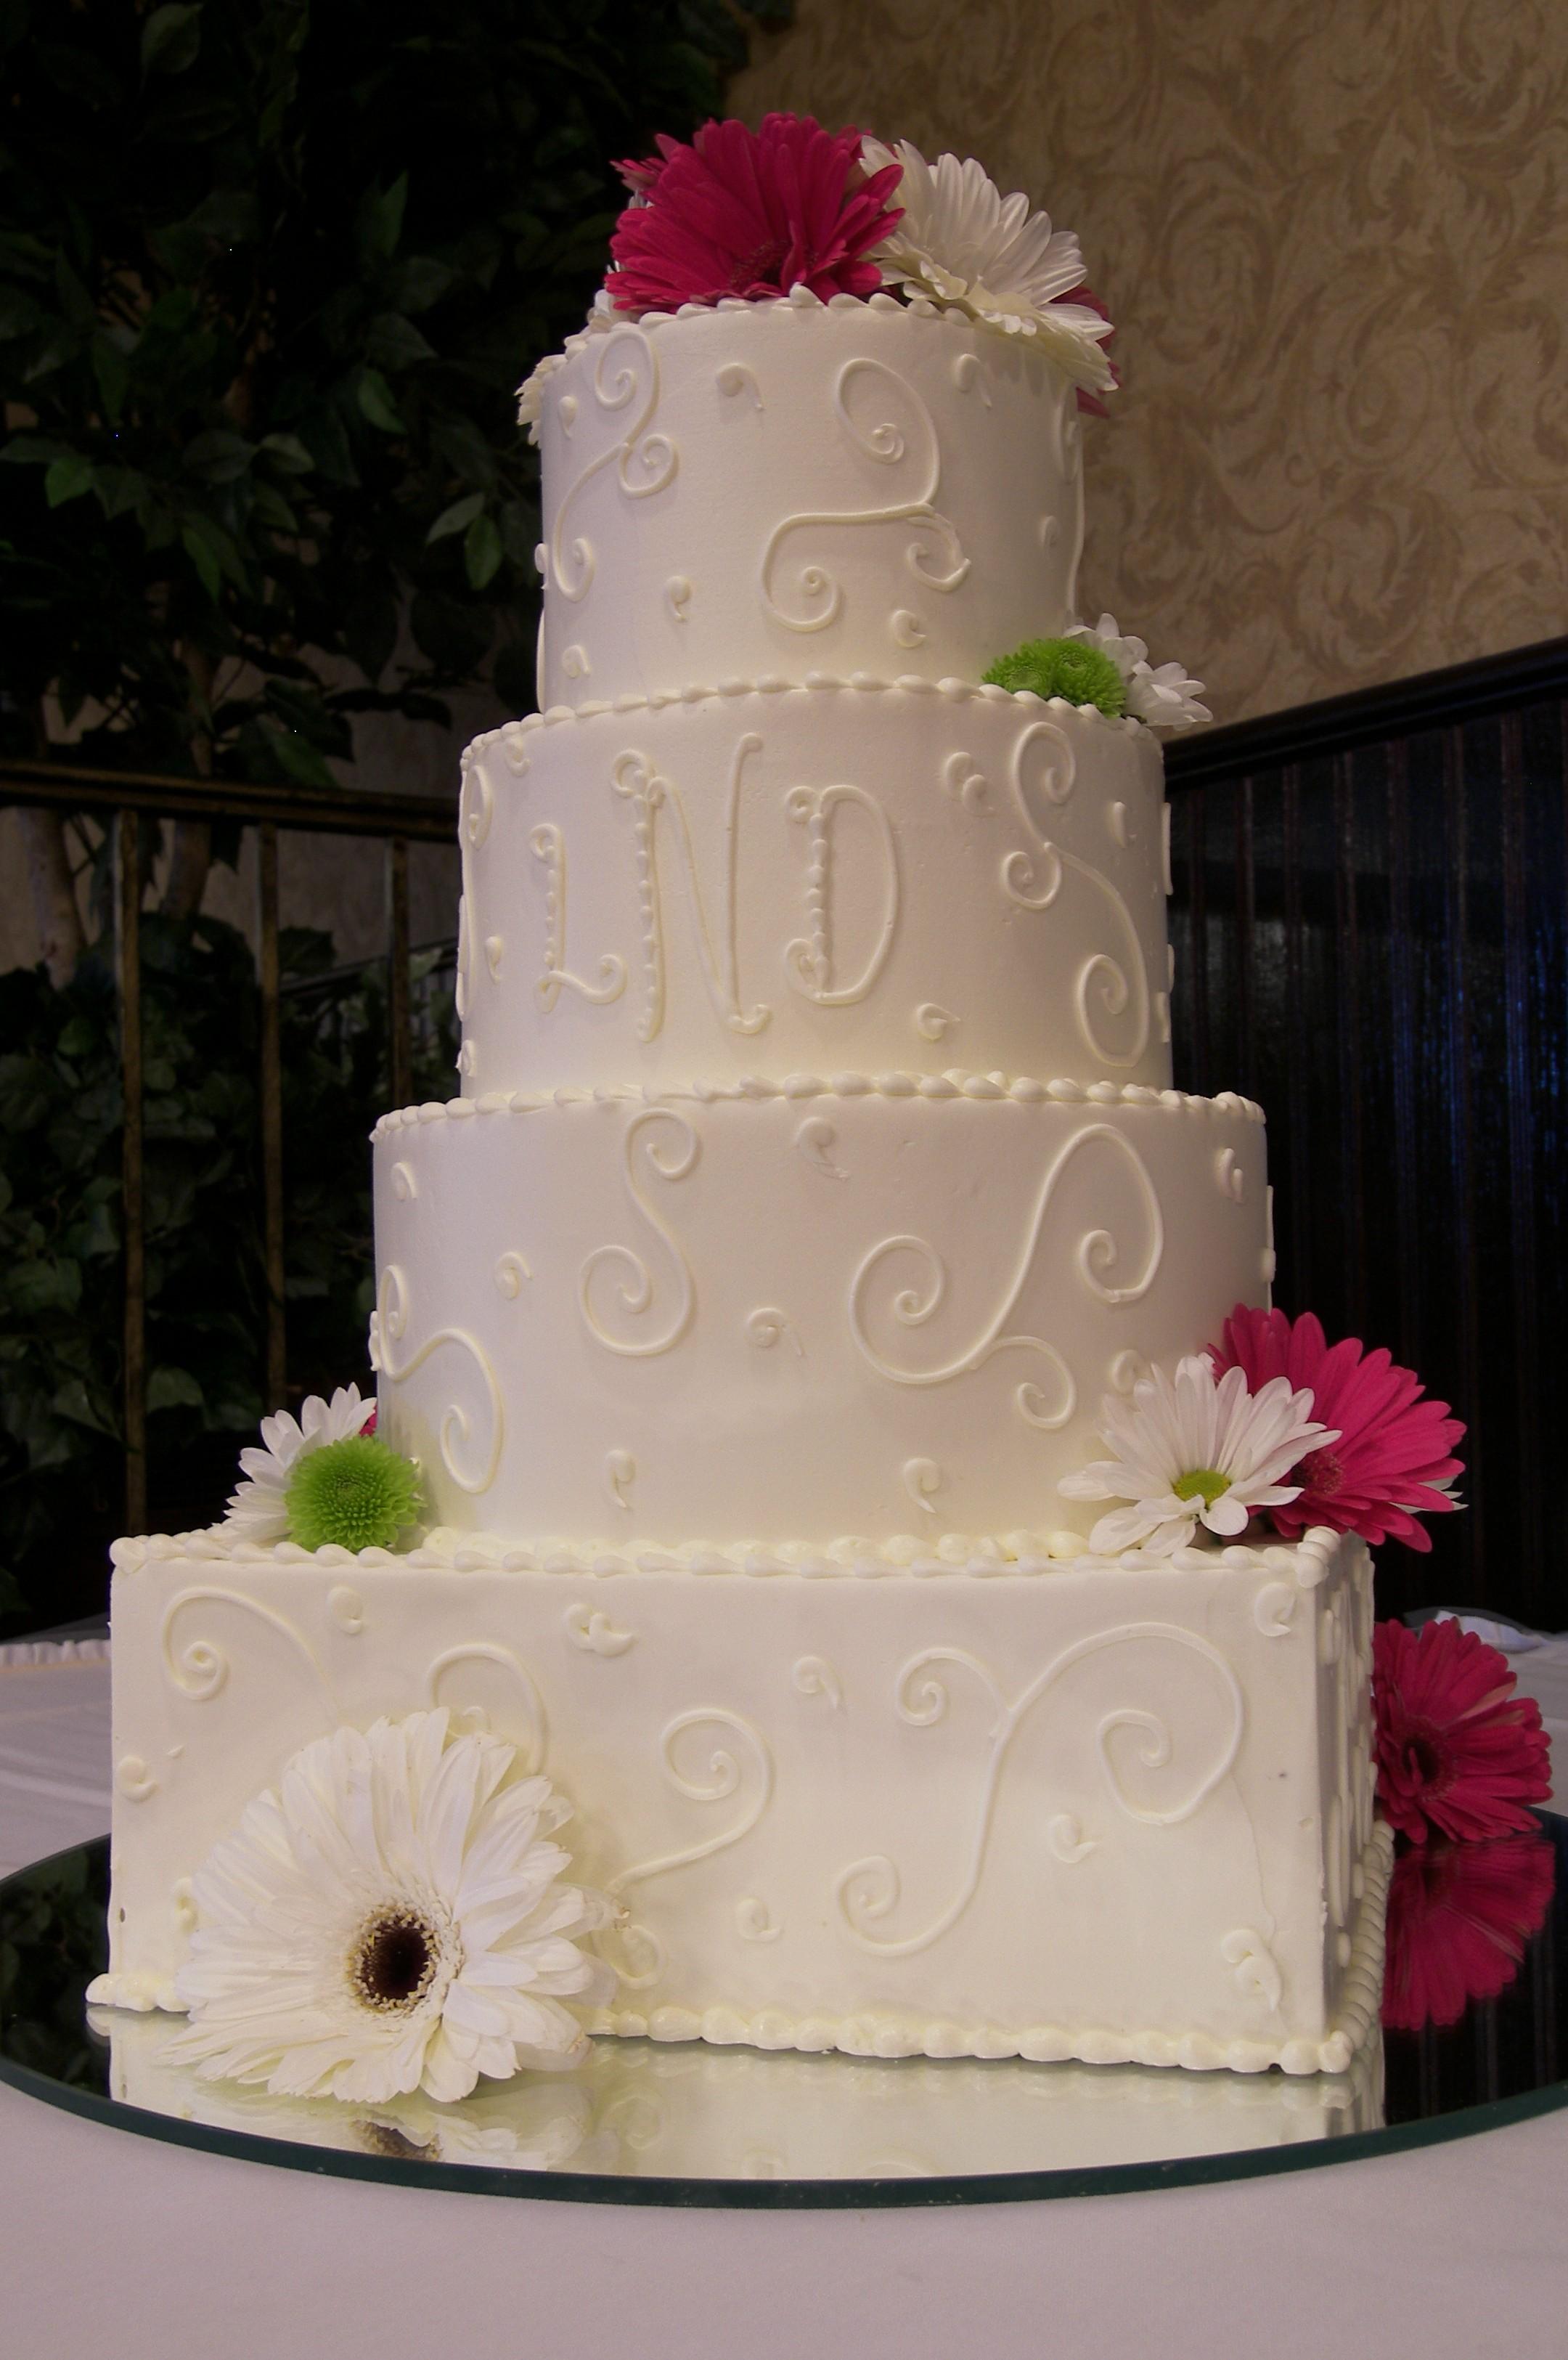 Joe's Cake